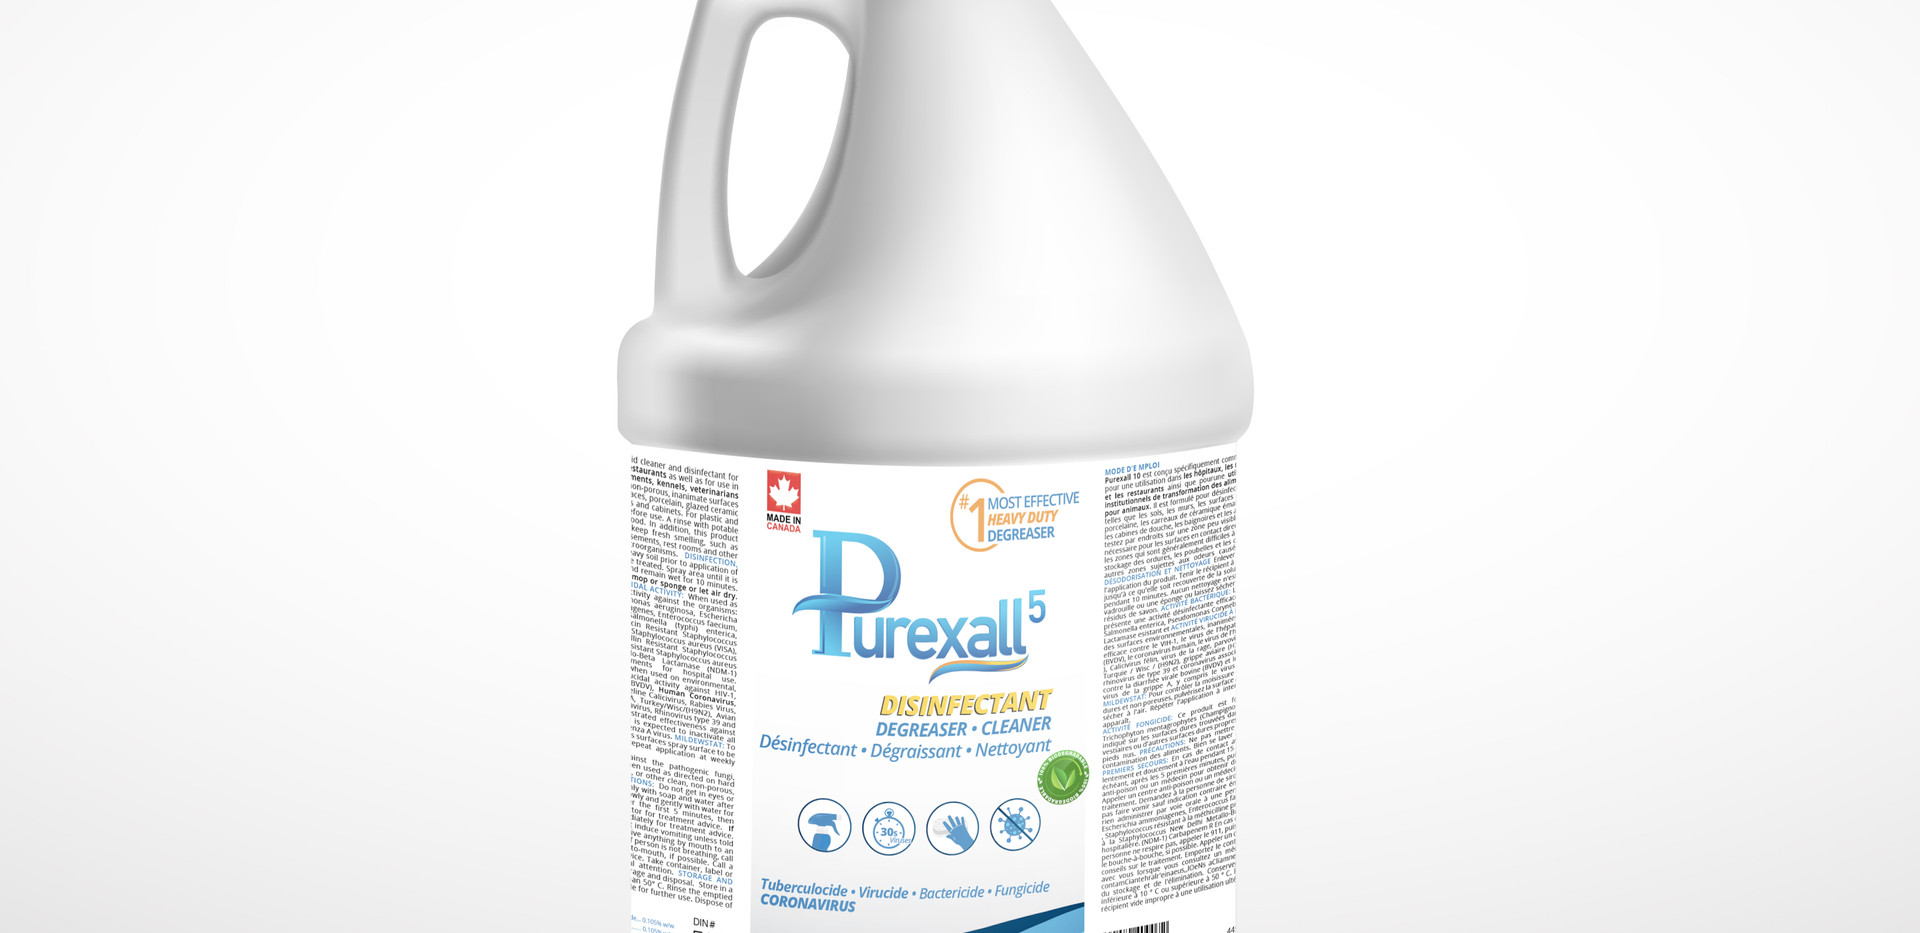 Purexall 5 4L Bottle.jpg